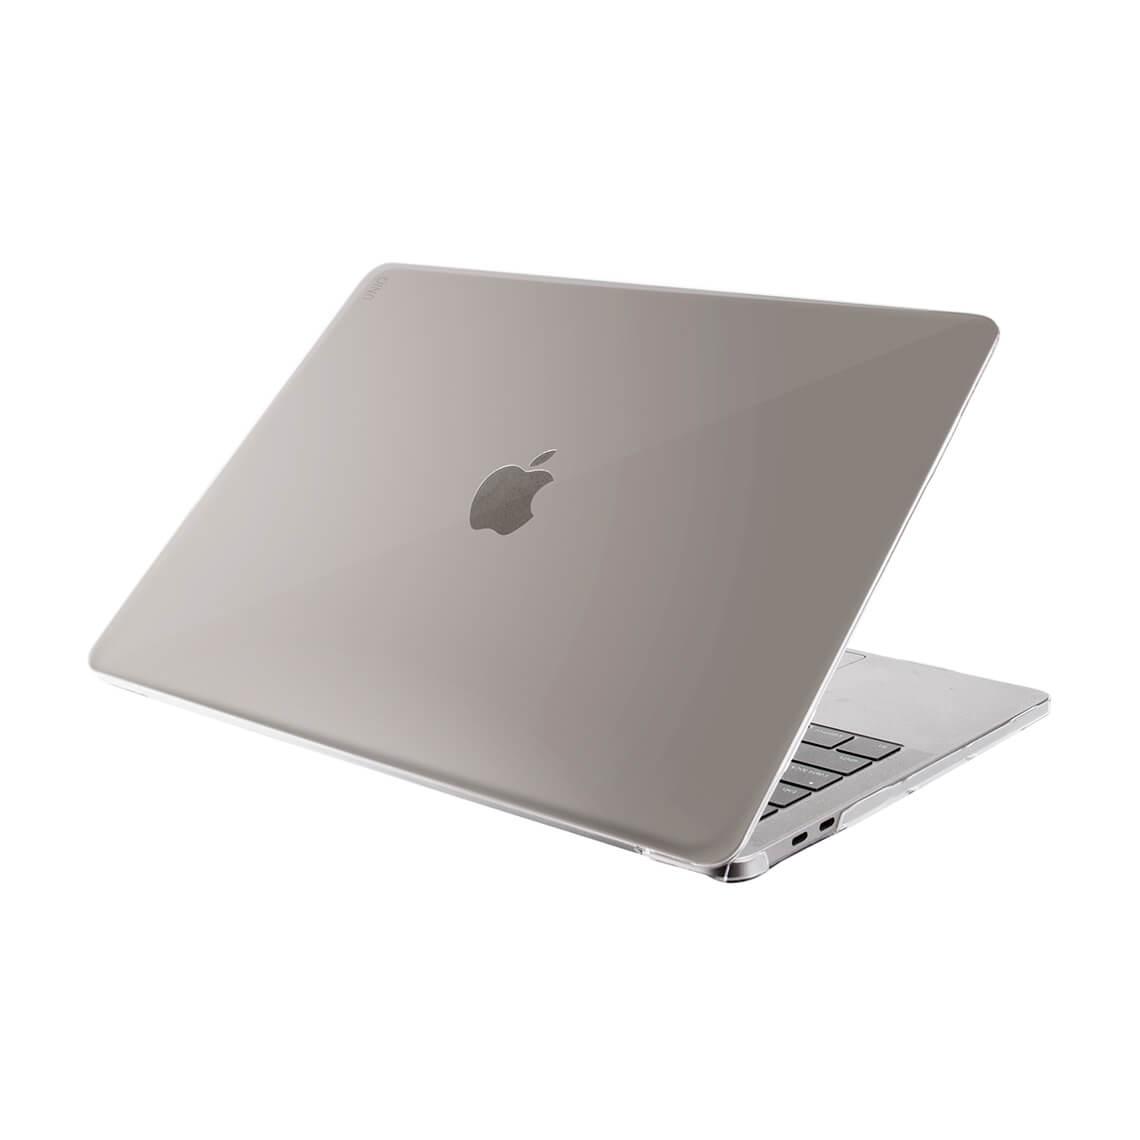 کاور یونیک مدل Husk Pro مناسب (MacBook Pro 15 (2016-2017